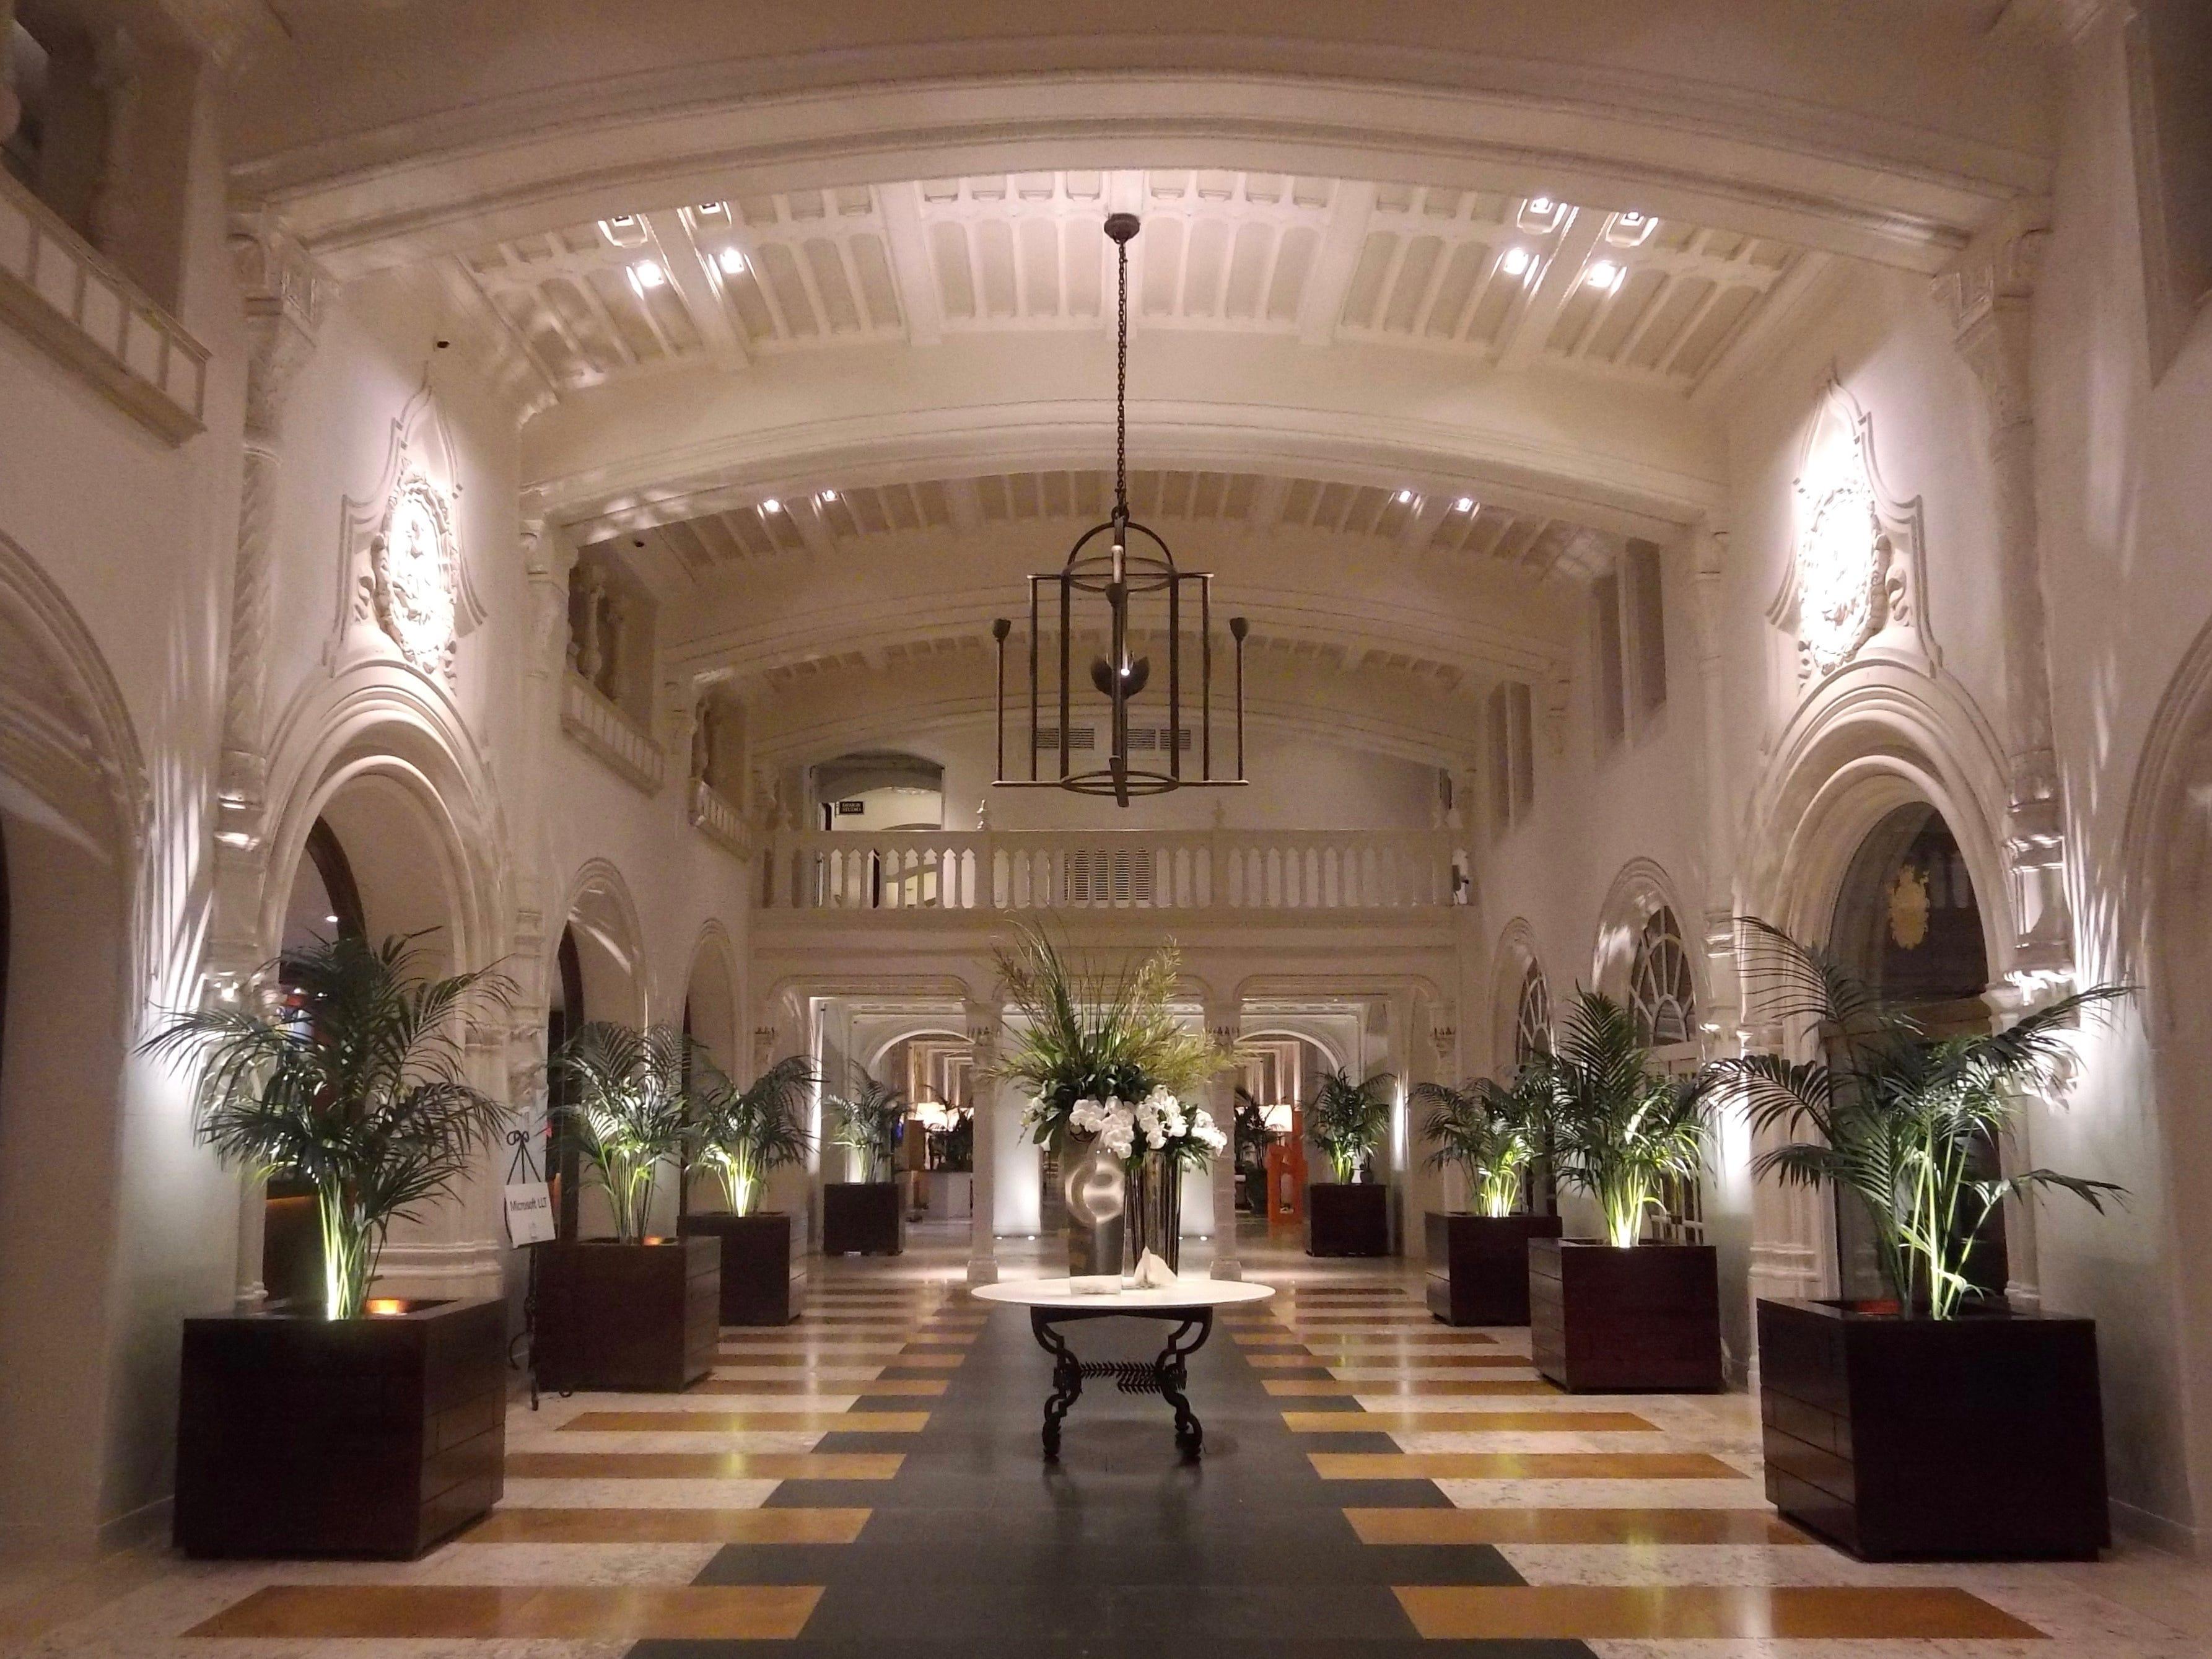 The elegant lobby of Boca Raton Resort & Club.